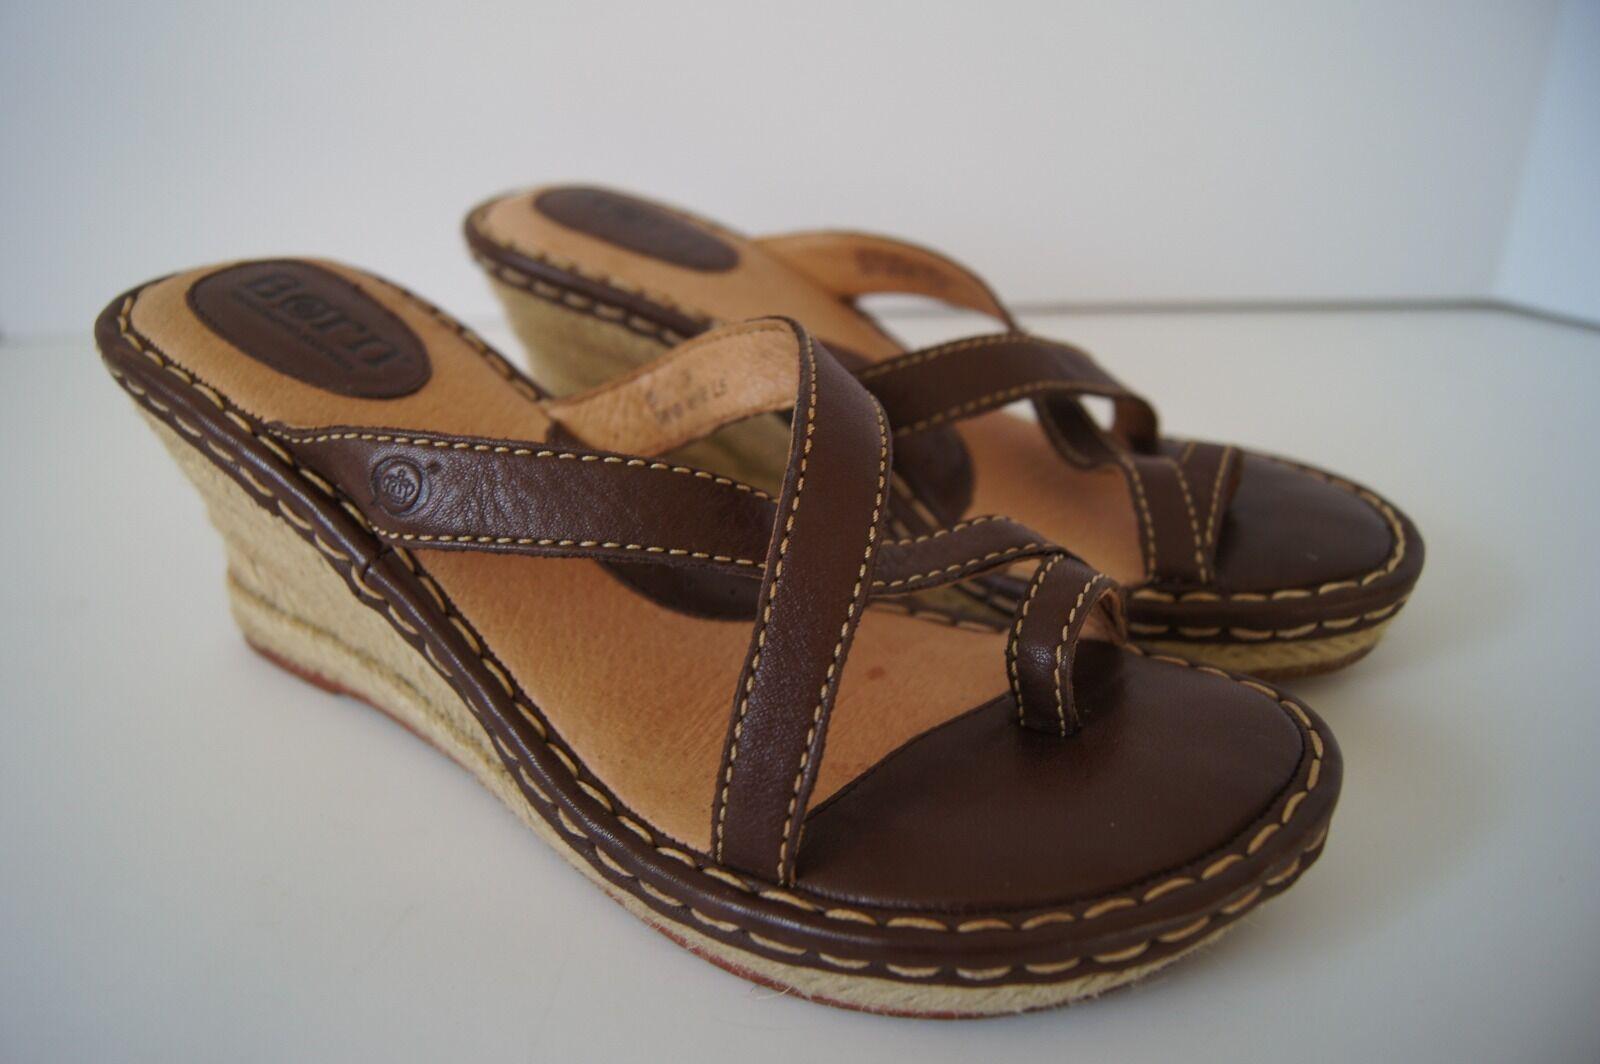 Né en Cuir Marron Plate-forme Wedge Sandales Taille 8 39